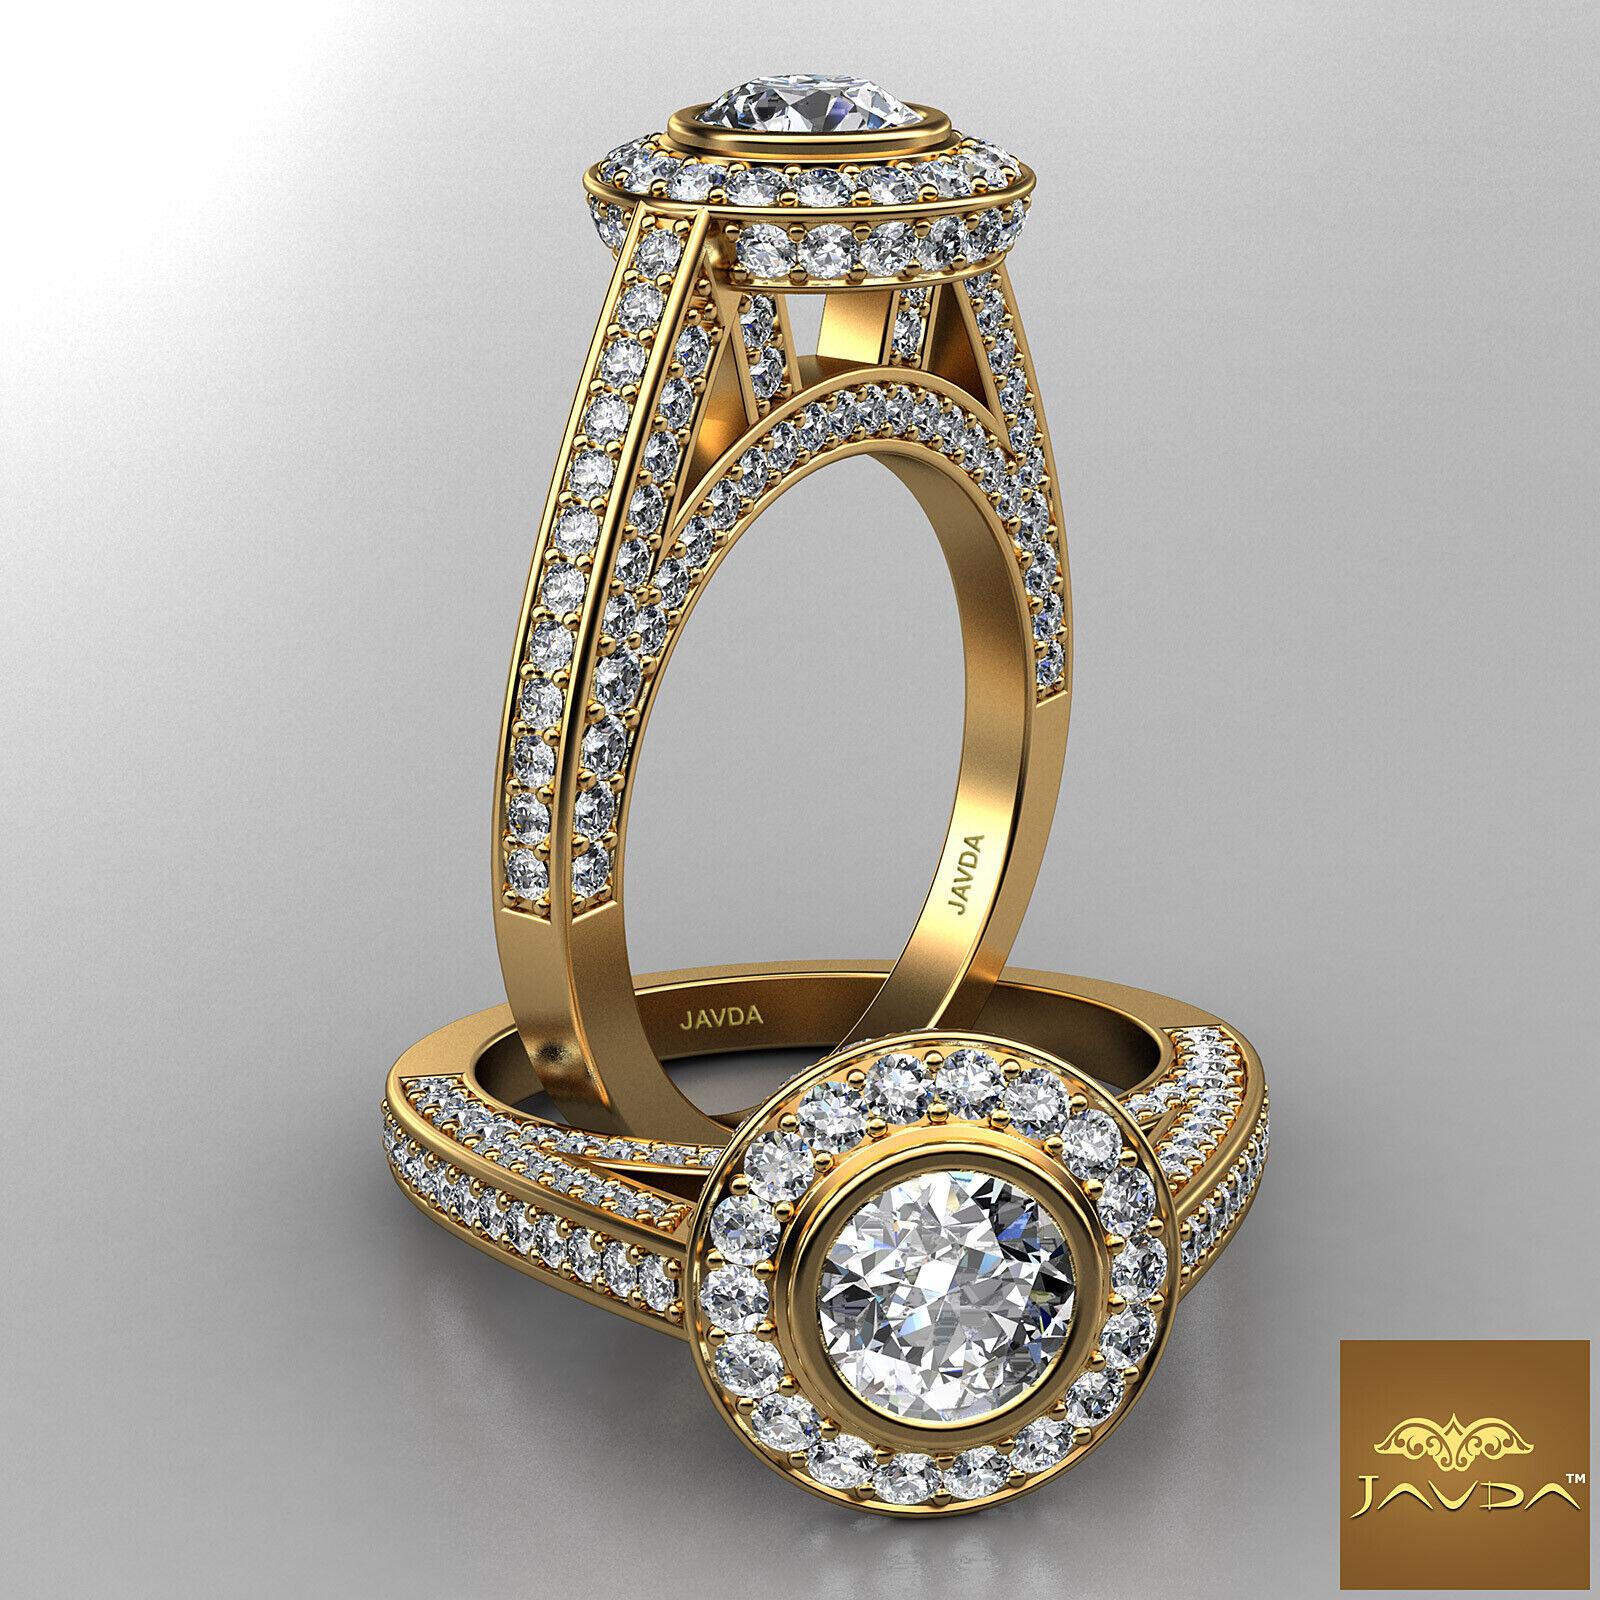 Bridge Accent Halo Pave Bezel Set Round Diamond Engagement Ring GIA F VS1 2.75Ct